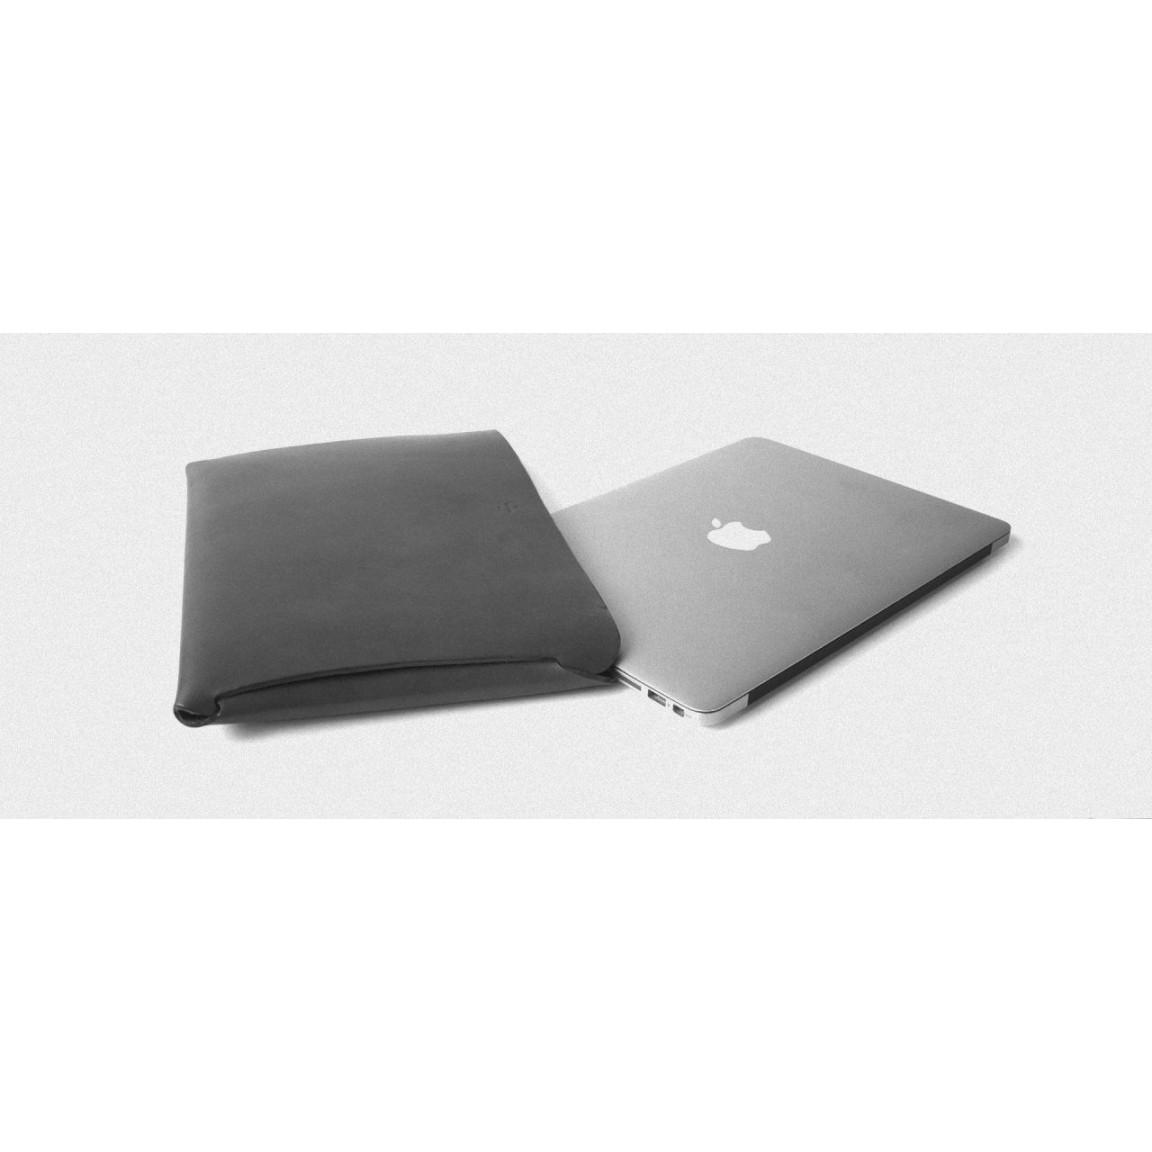 iPad Tab Media Case | Chestnut